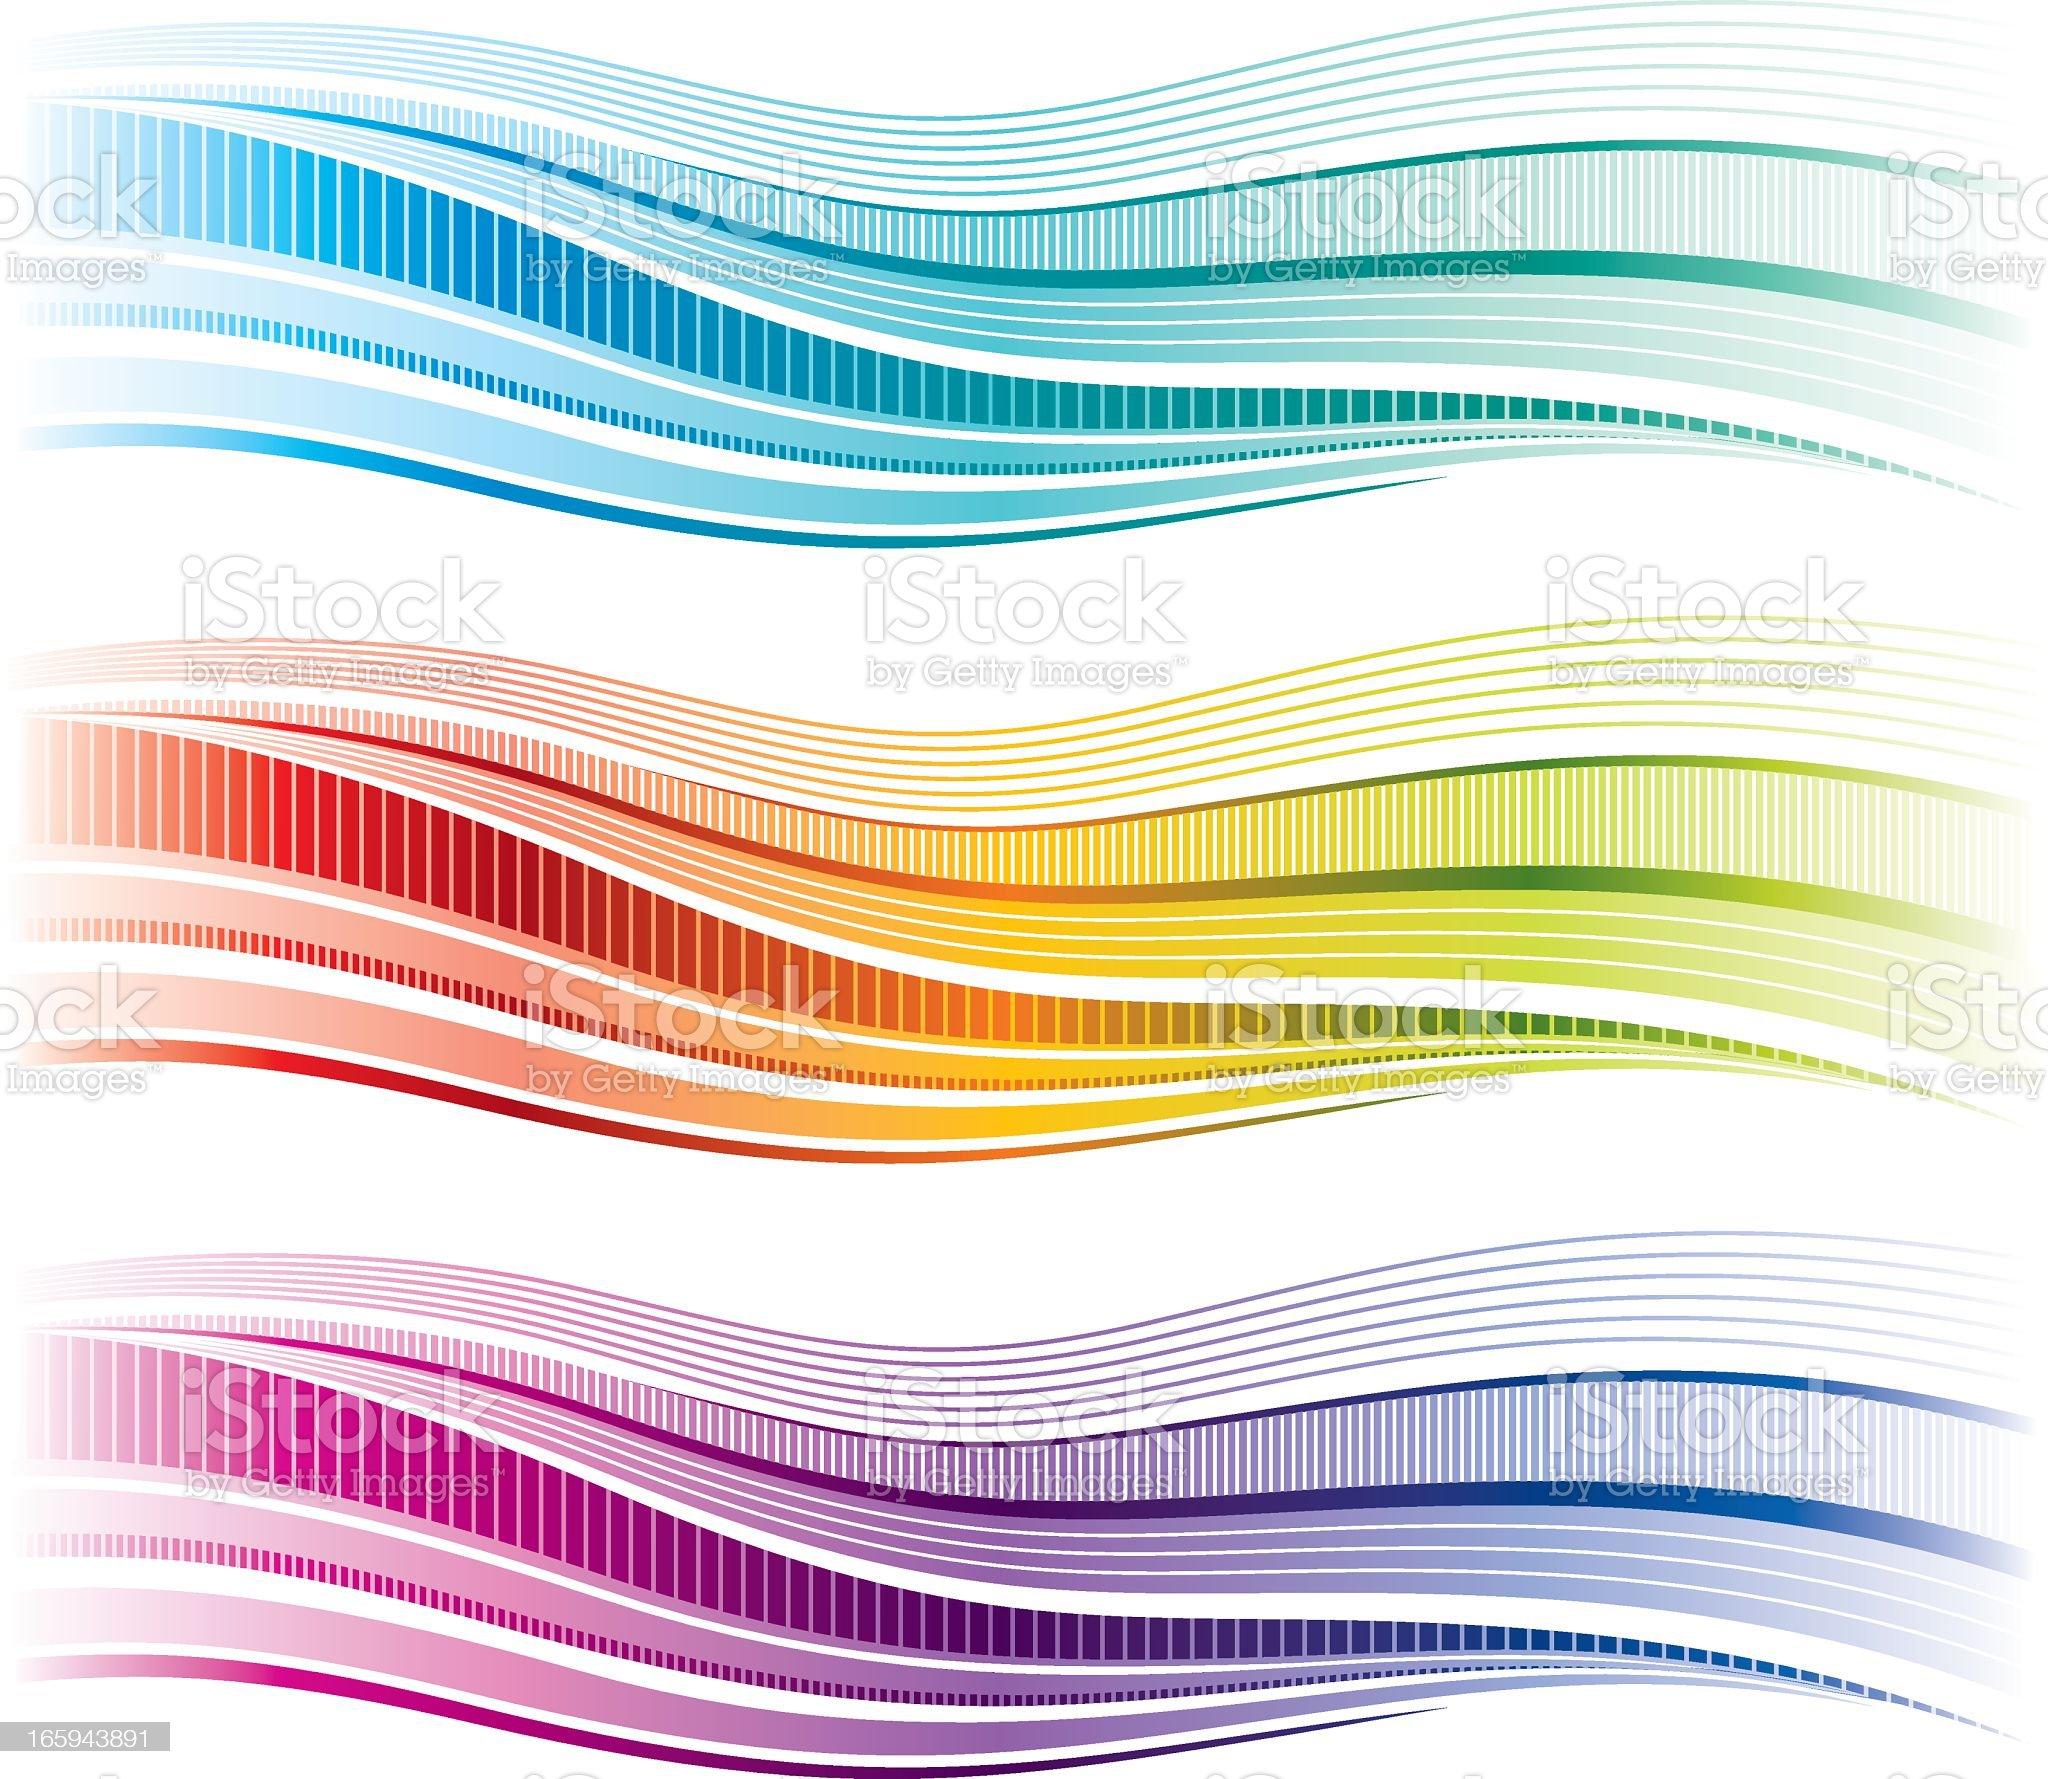 Simple rainbow wave royalty-free stock vector art